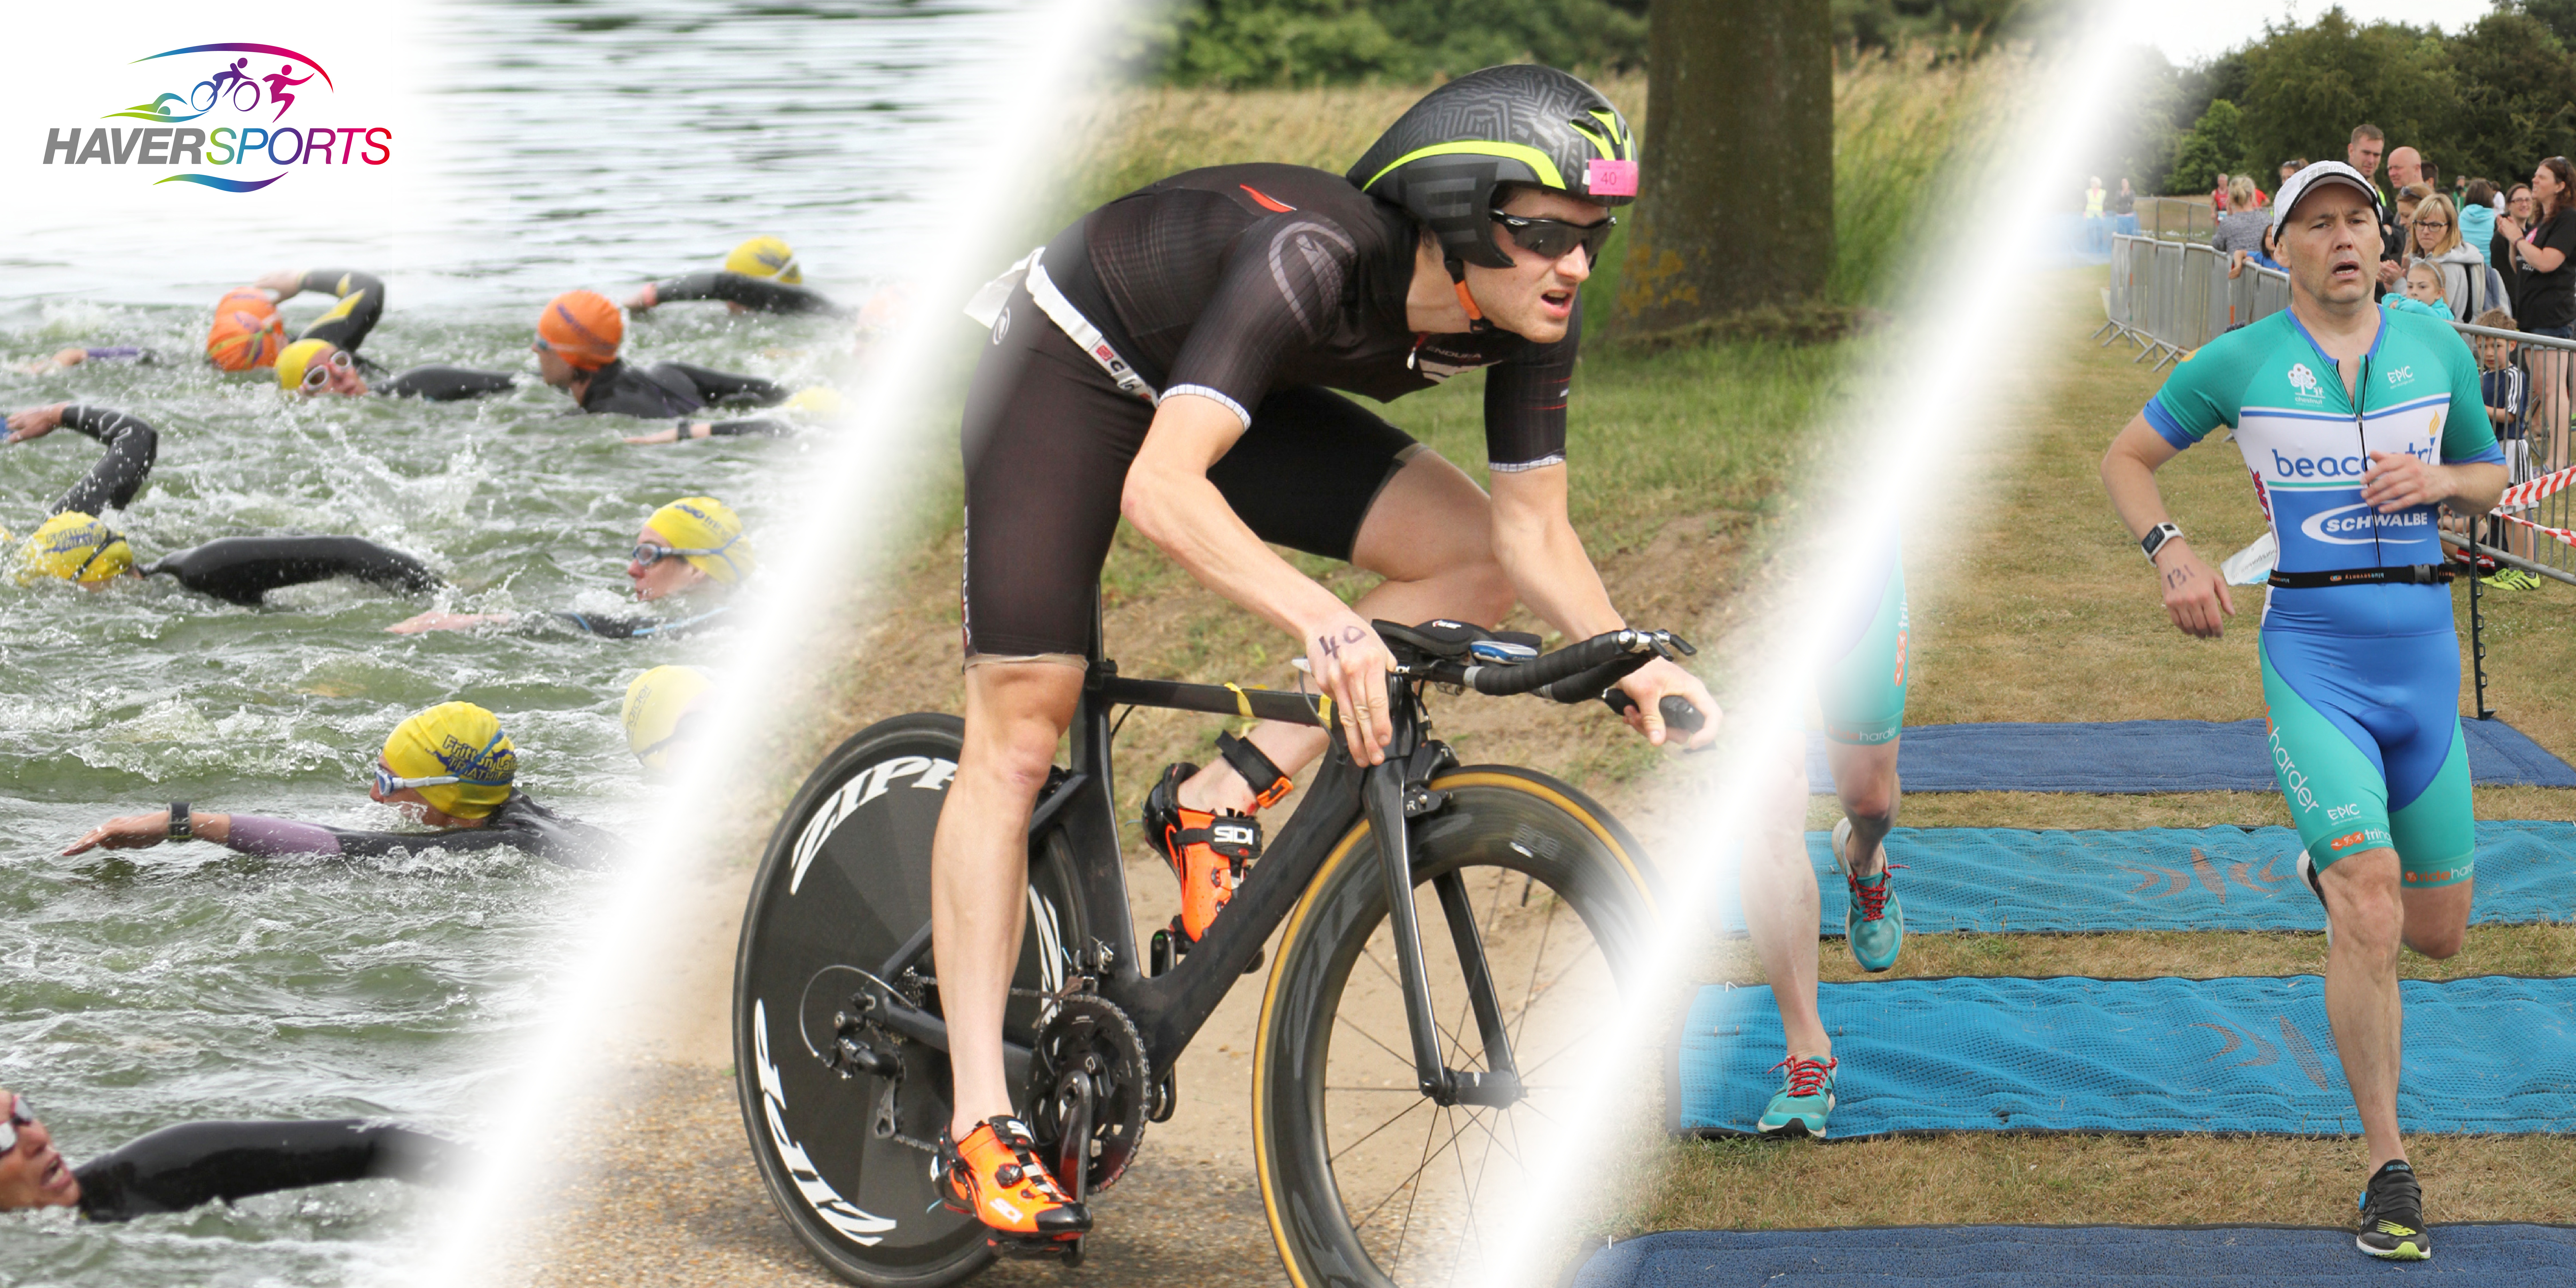 HaverSports Fritton Lake Triathlon Weekend - cover image